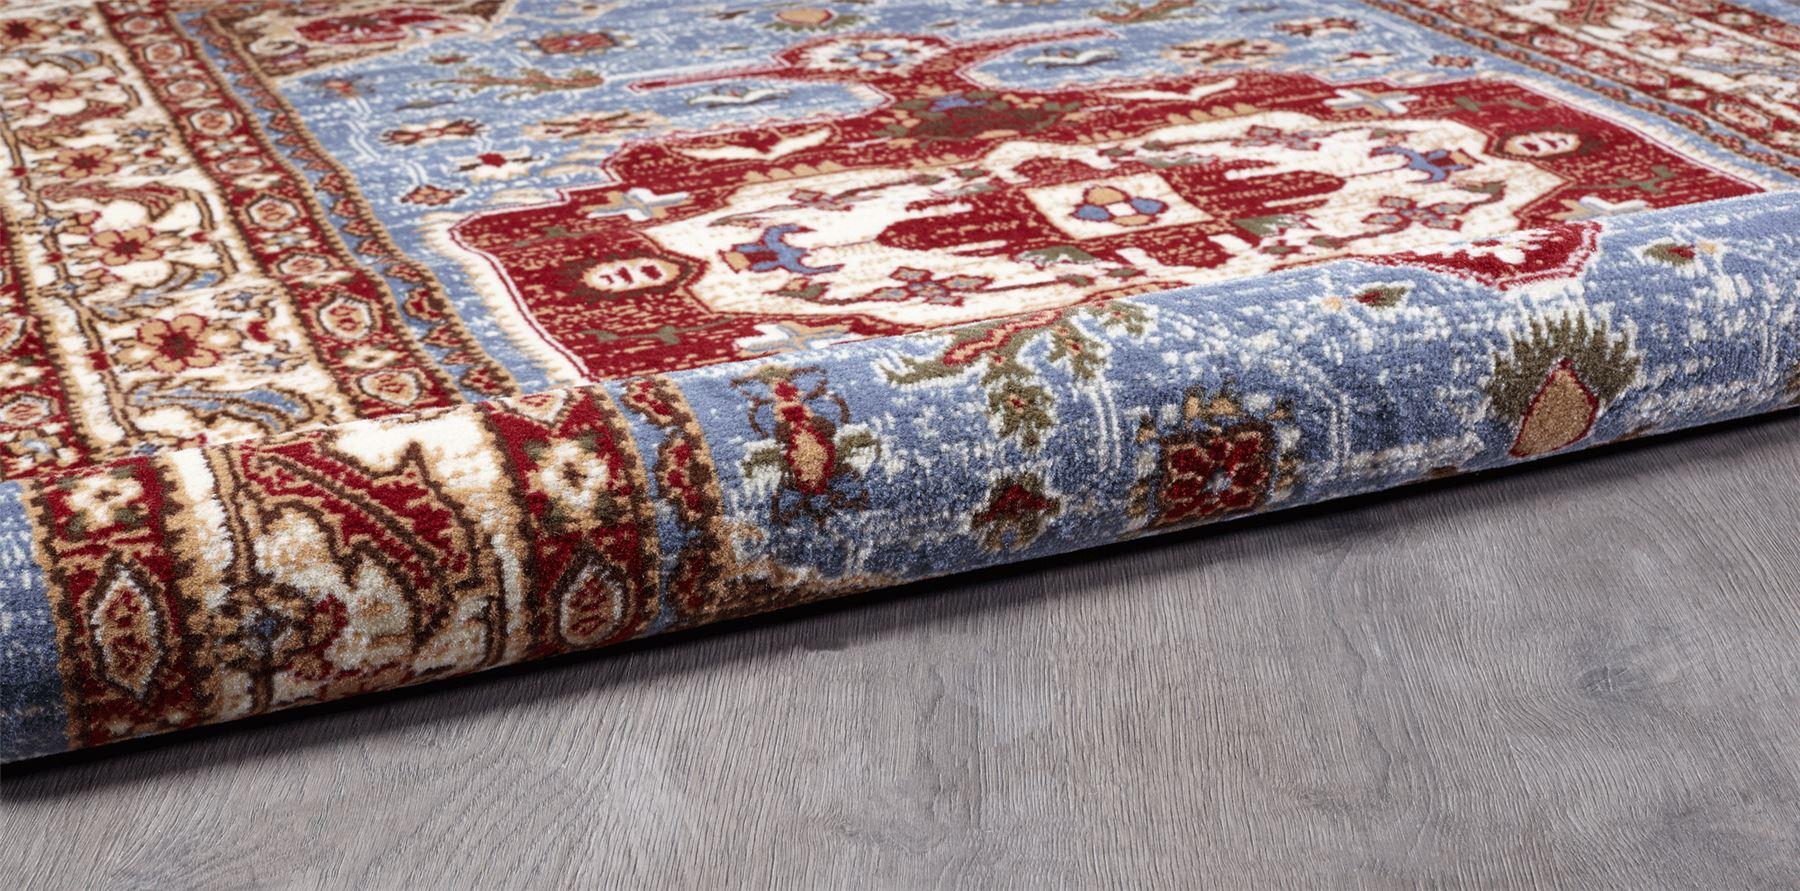 Blue Traditional Persian Carpets Red Medallion Geometric Rugs Cream Oriental Mat